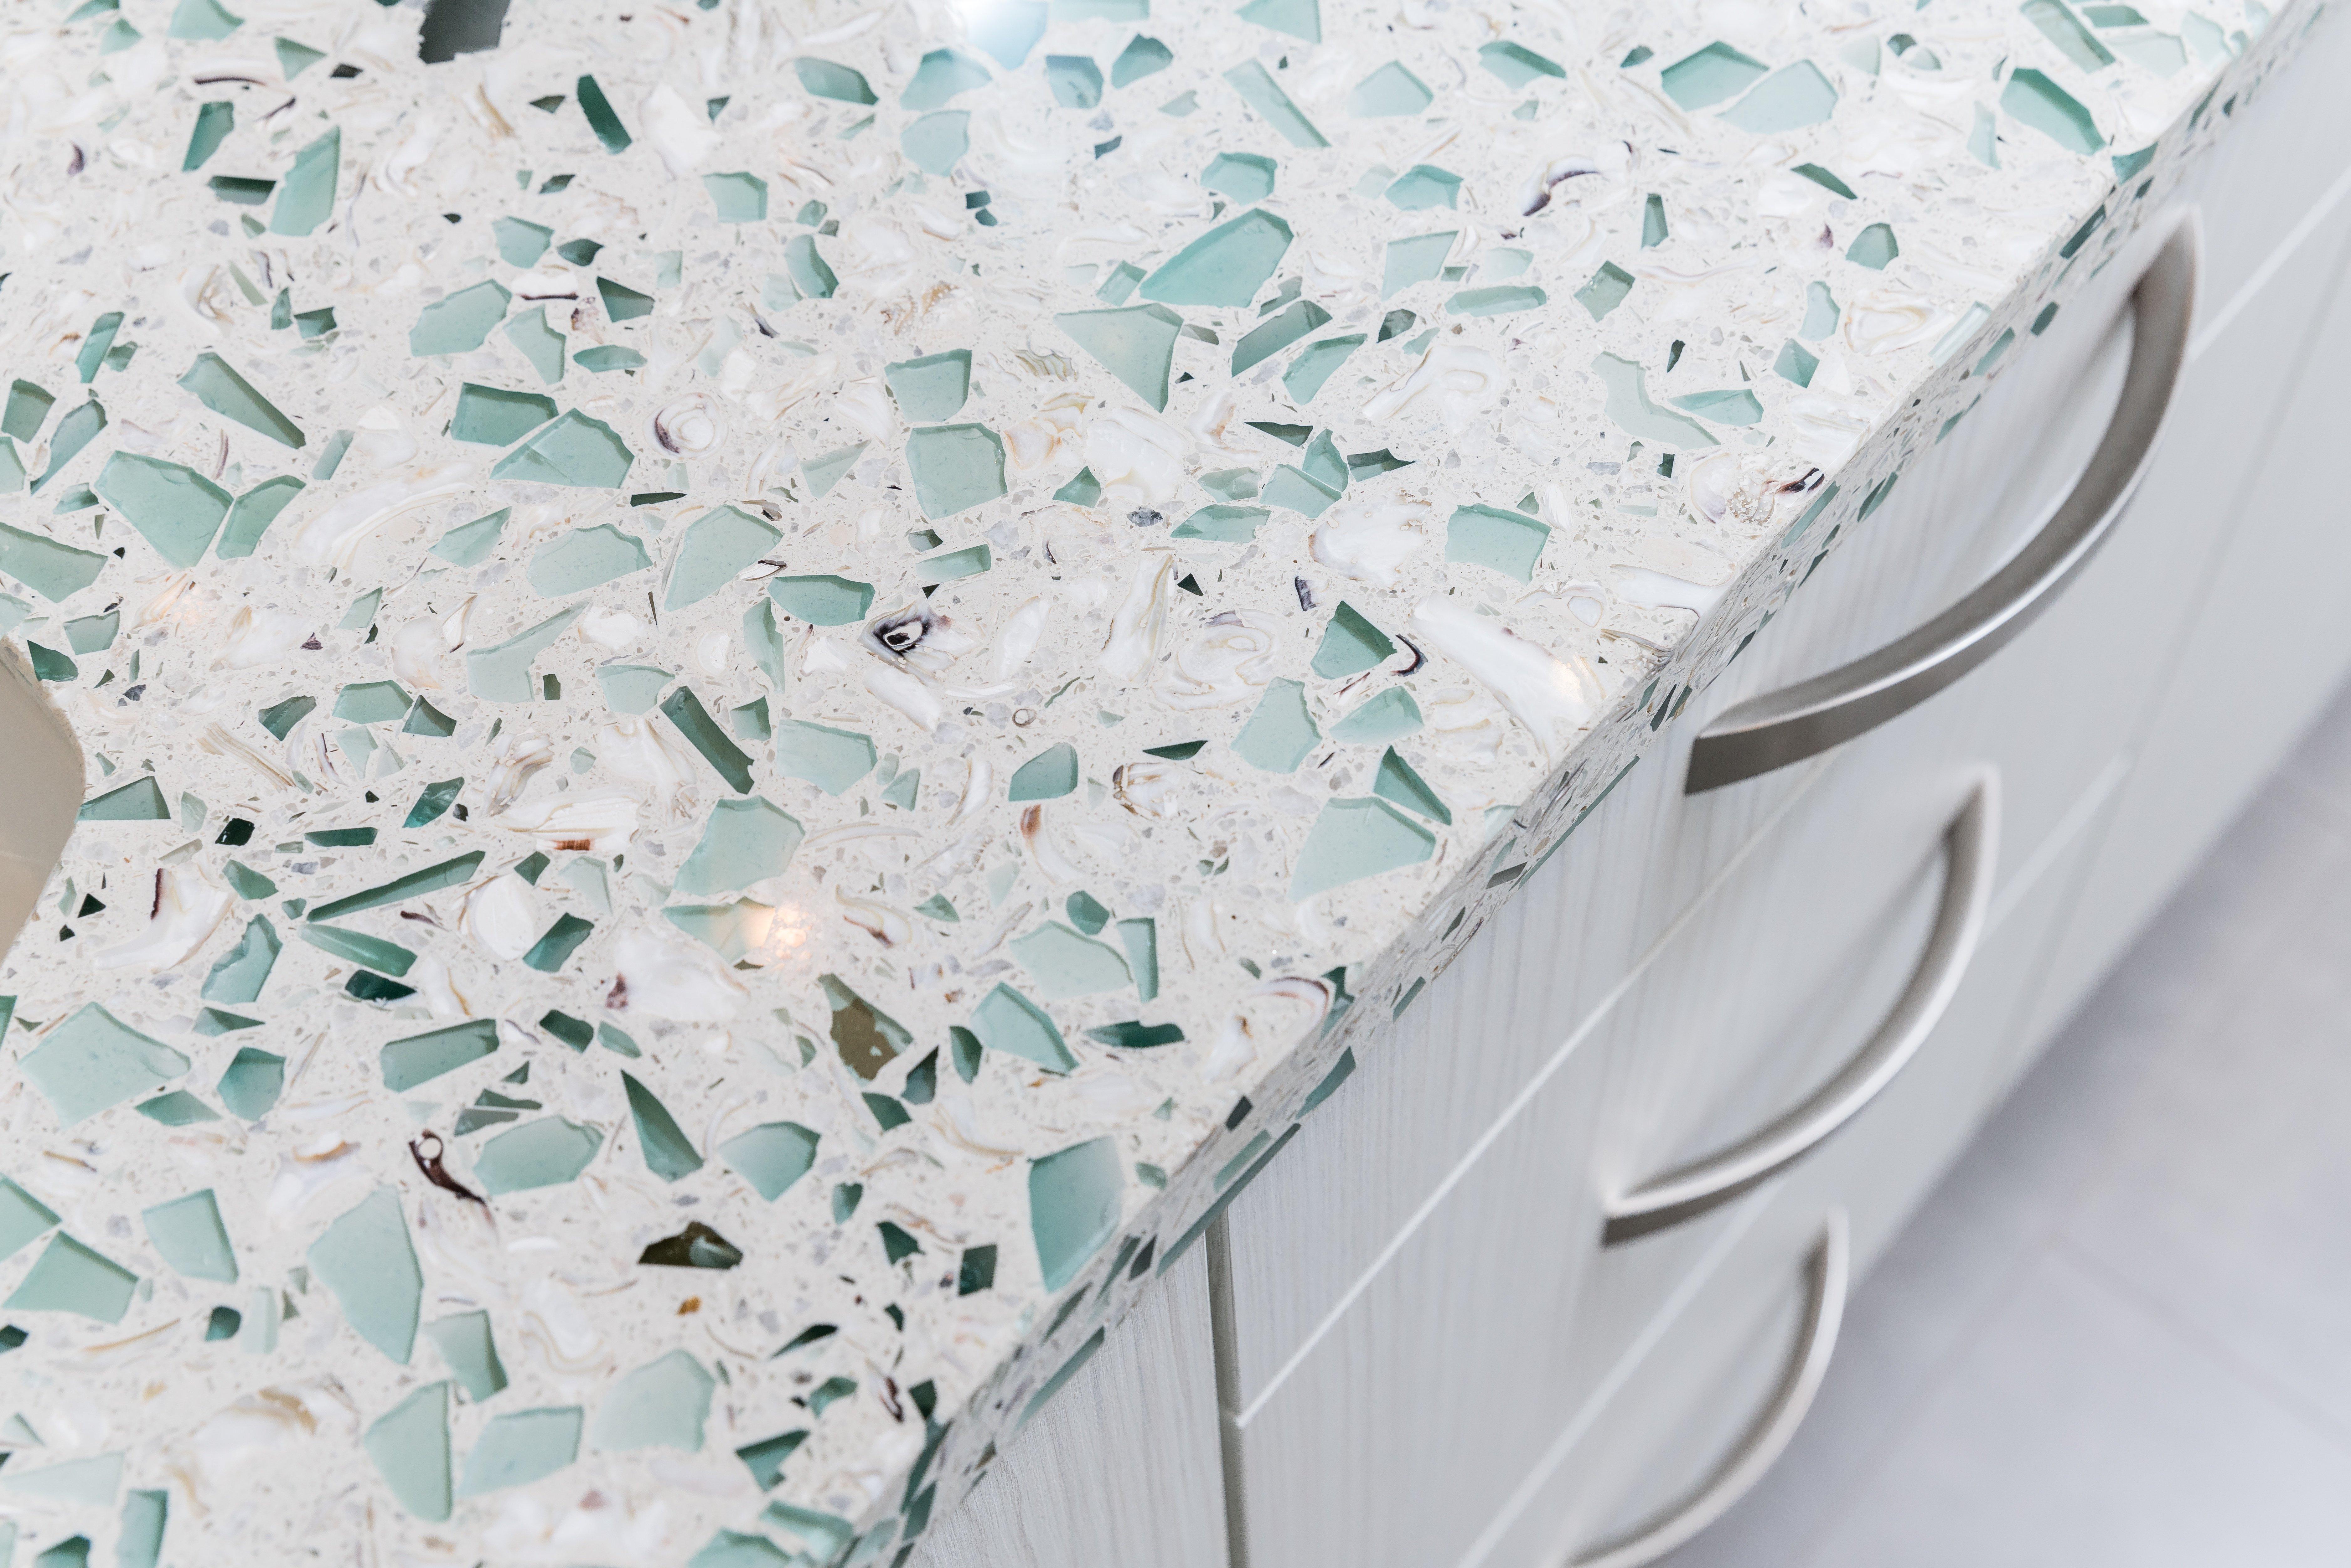 vetrazzo-emerald-coast-recycled-glass-countertop-1